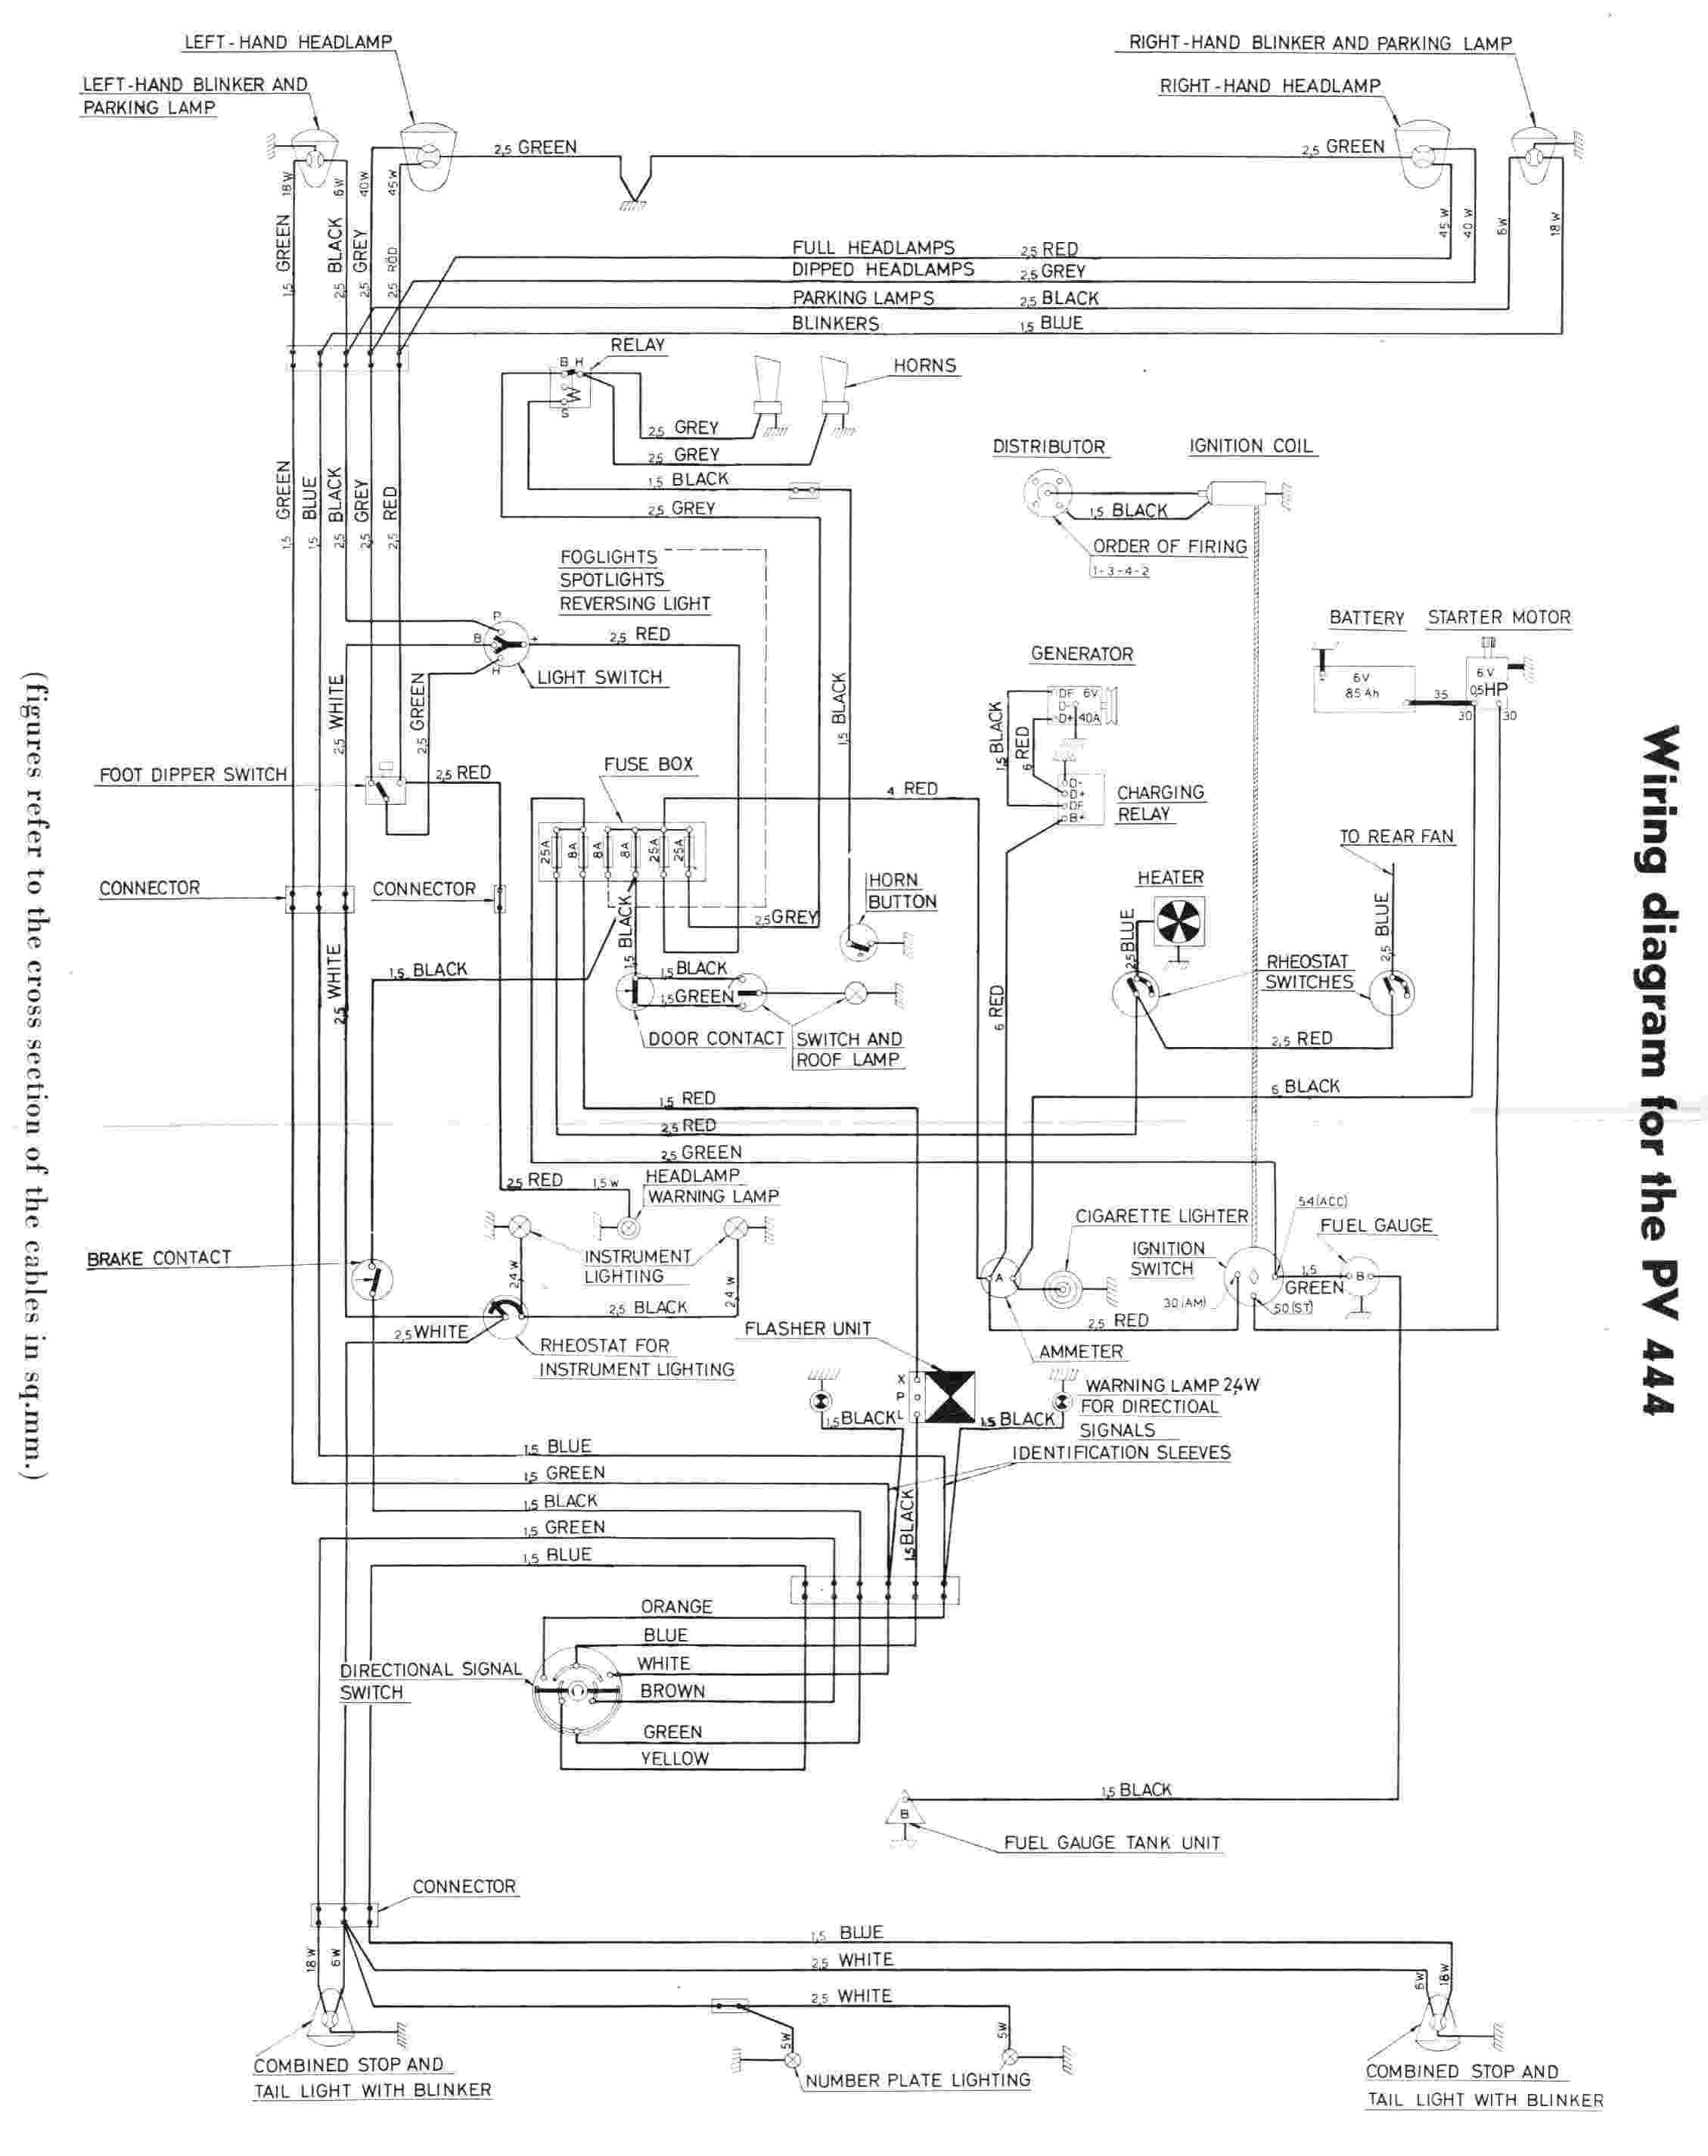 medium resolution of volvo 360 wiring diagram online wiring diagramvn alternator wiring diagram wiring diagrams volvo 360 wiring diagram